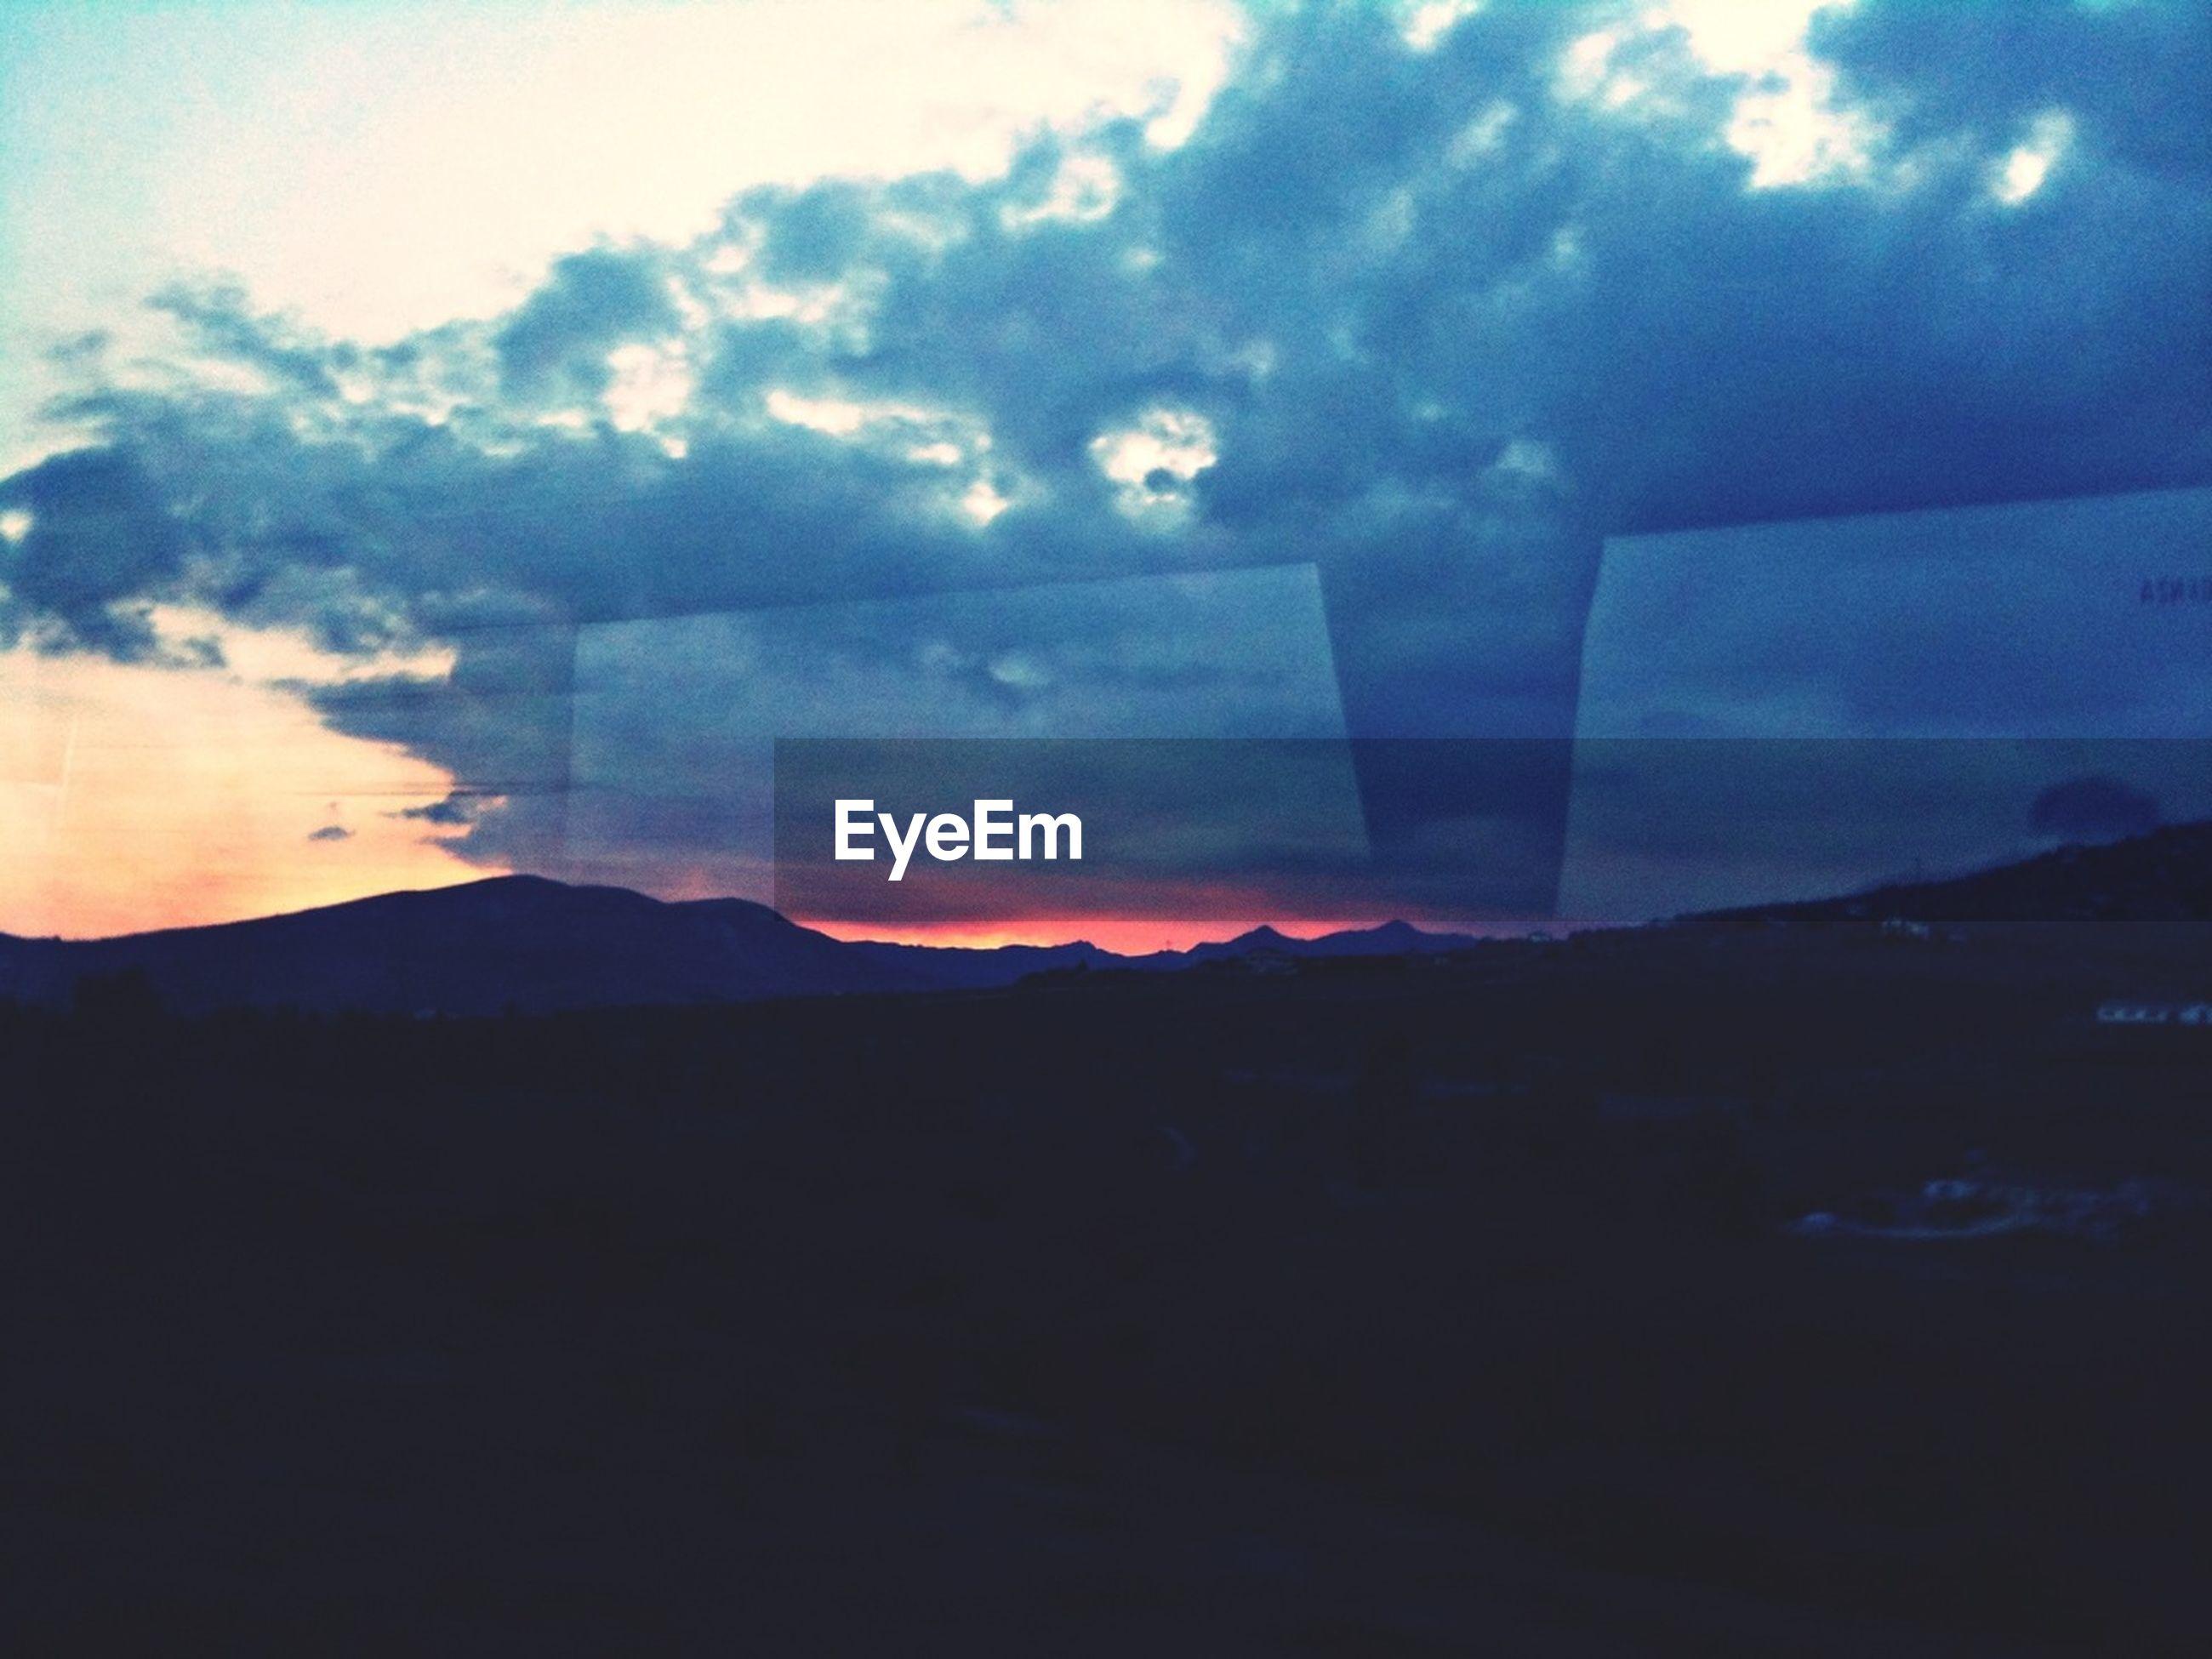 sky, sunset, scenics, cloud - sky, landscape, silhouette, tranquility, tranquil scene, beauty in nature, nature, cloud, idyllic, cloudy, mountain, dusk, dark, dramatic sky, outdoors, non-urban scene, sunlight